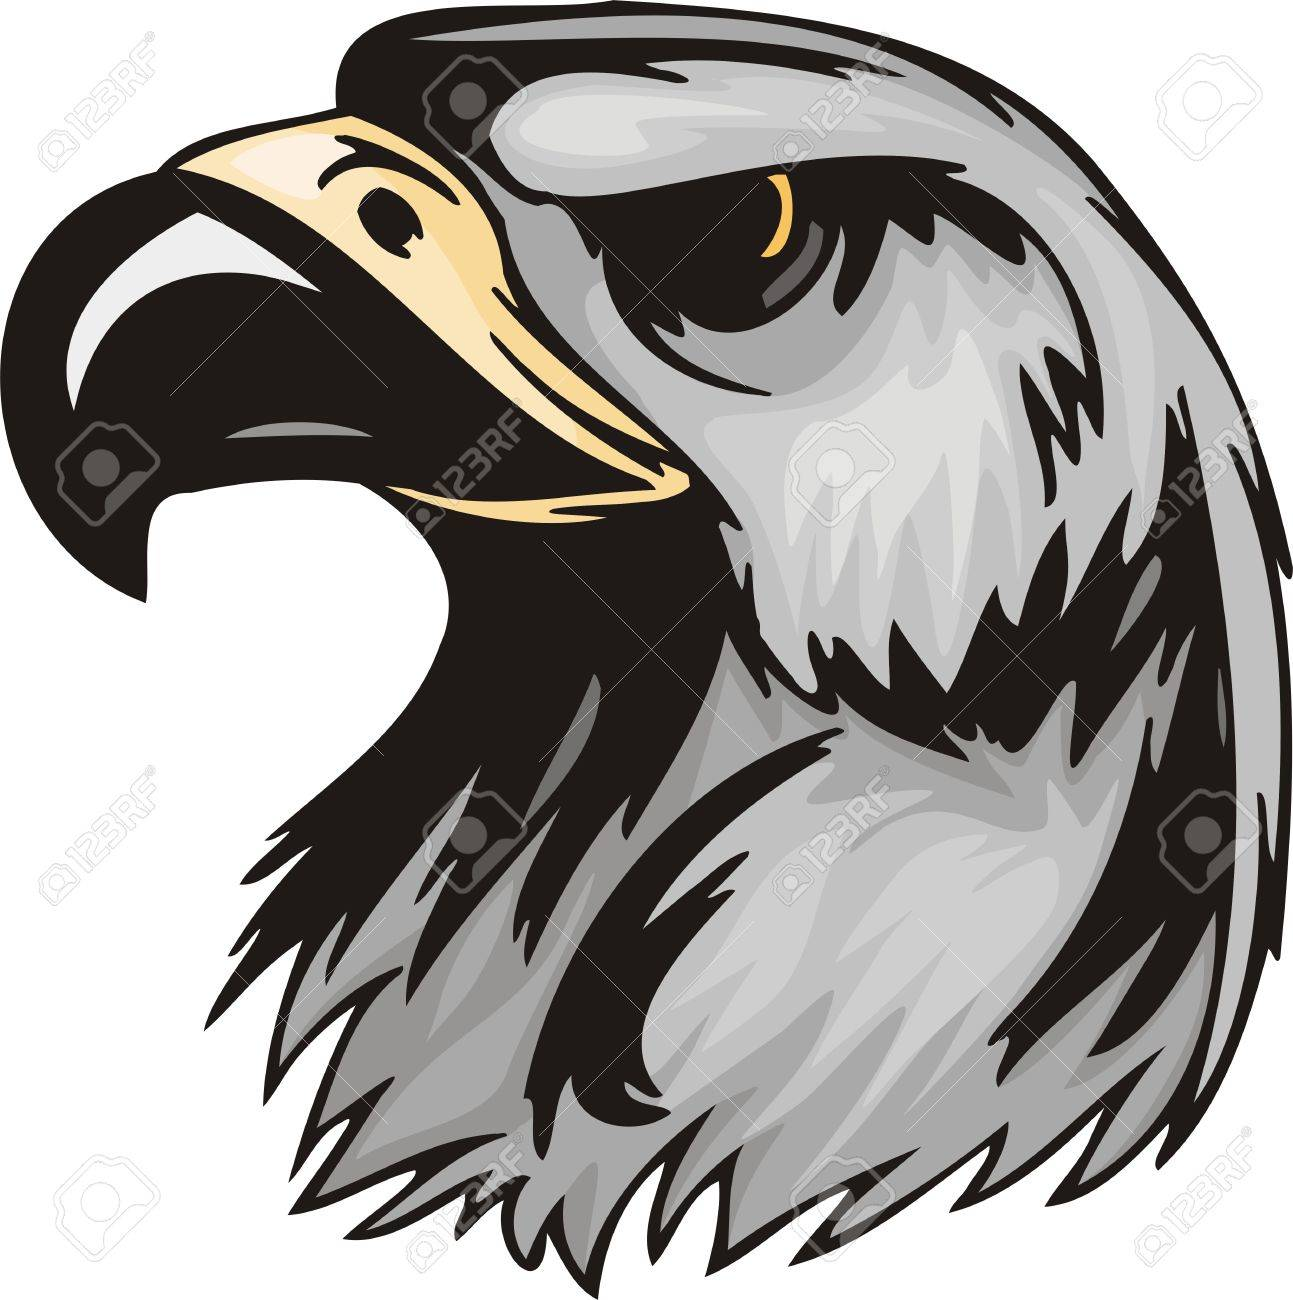 head of an eagle with the big sharp bill predatory birds